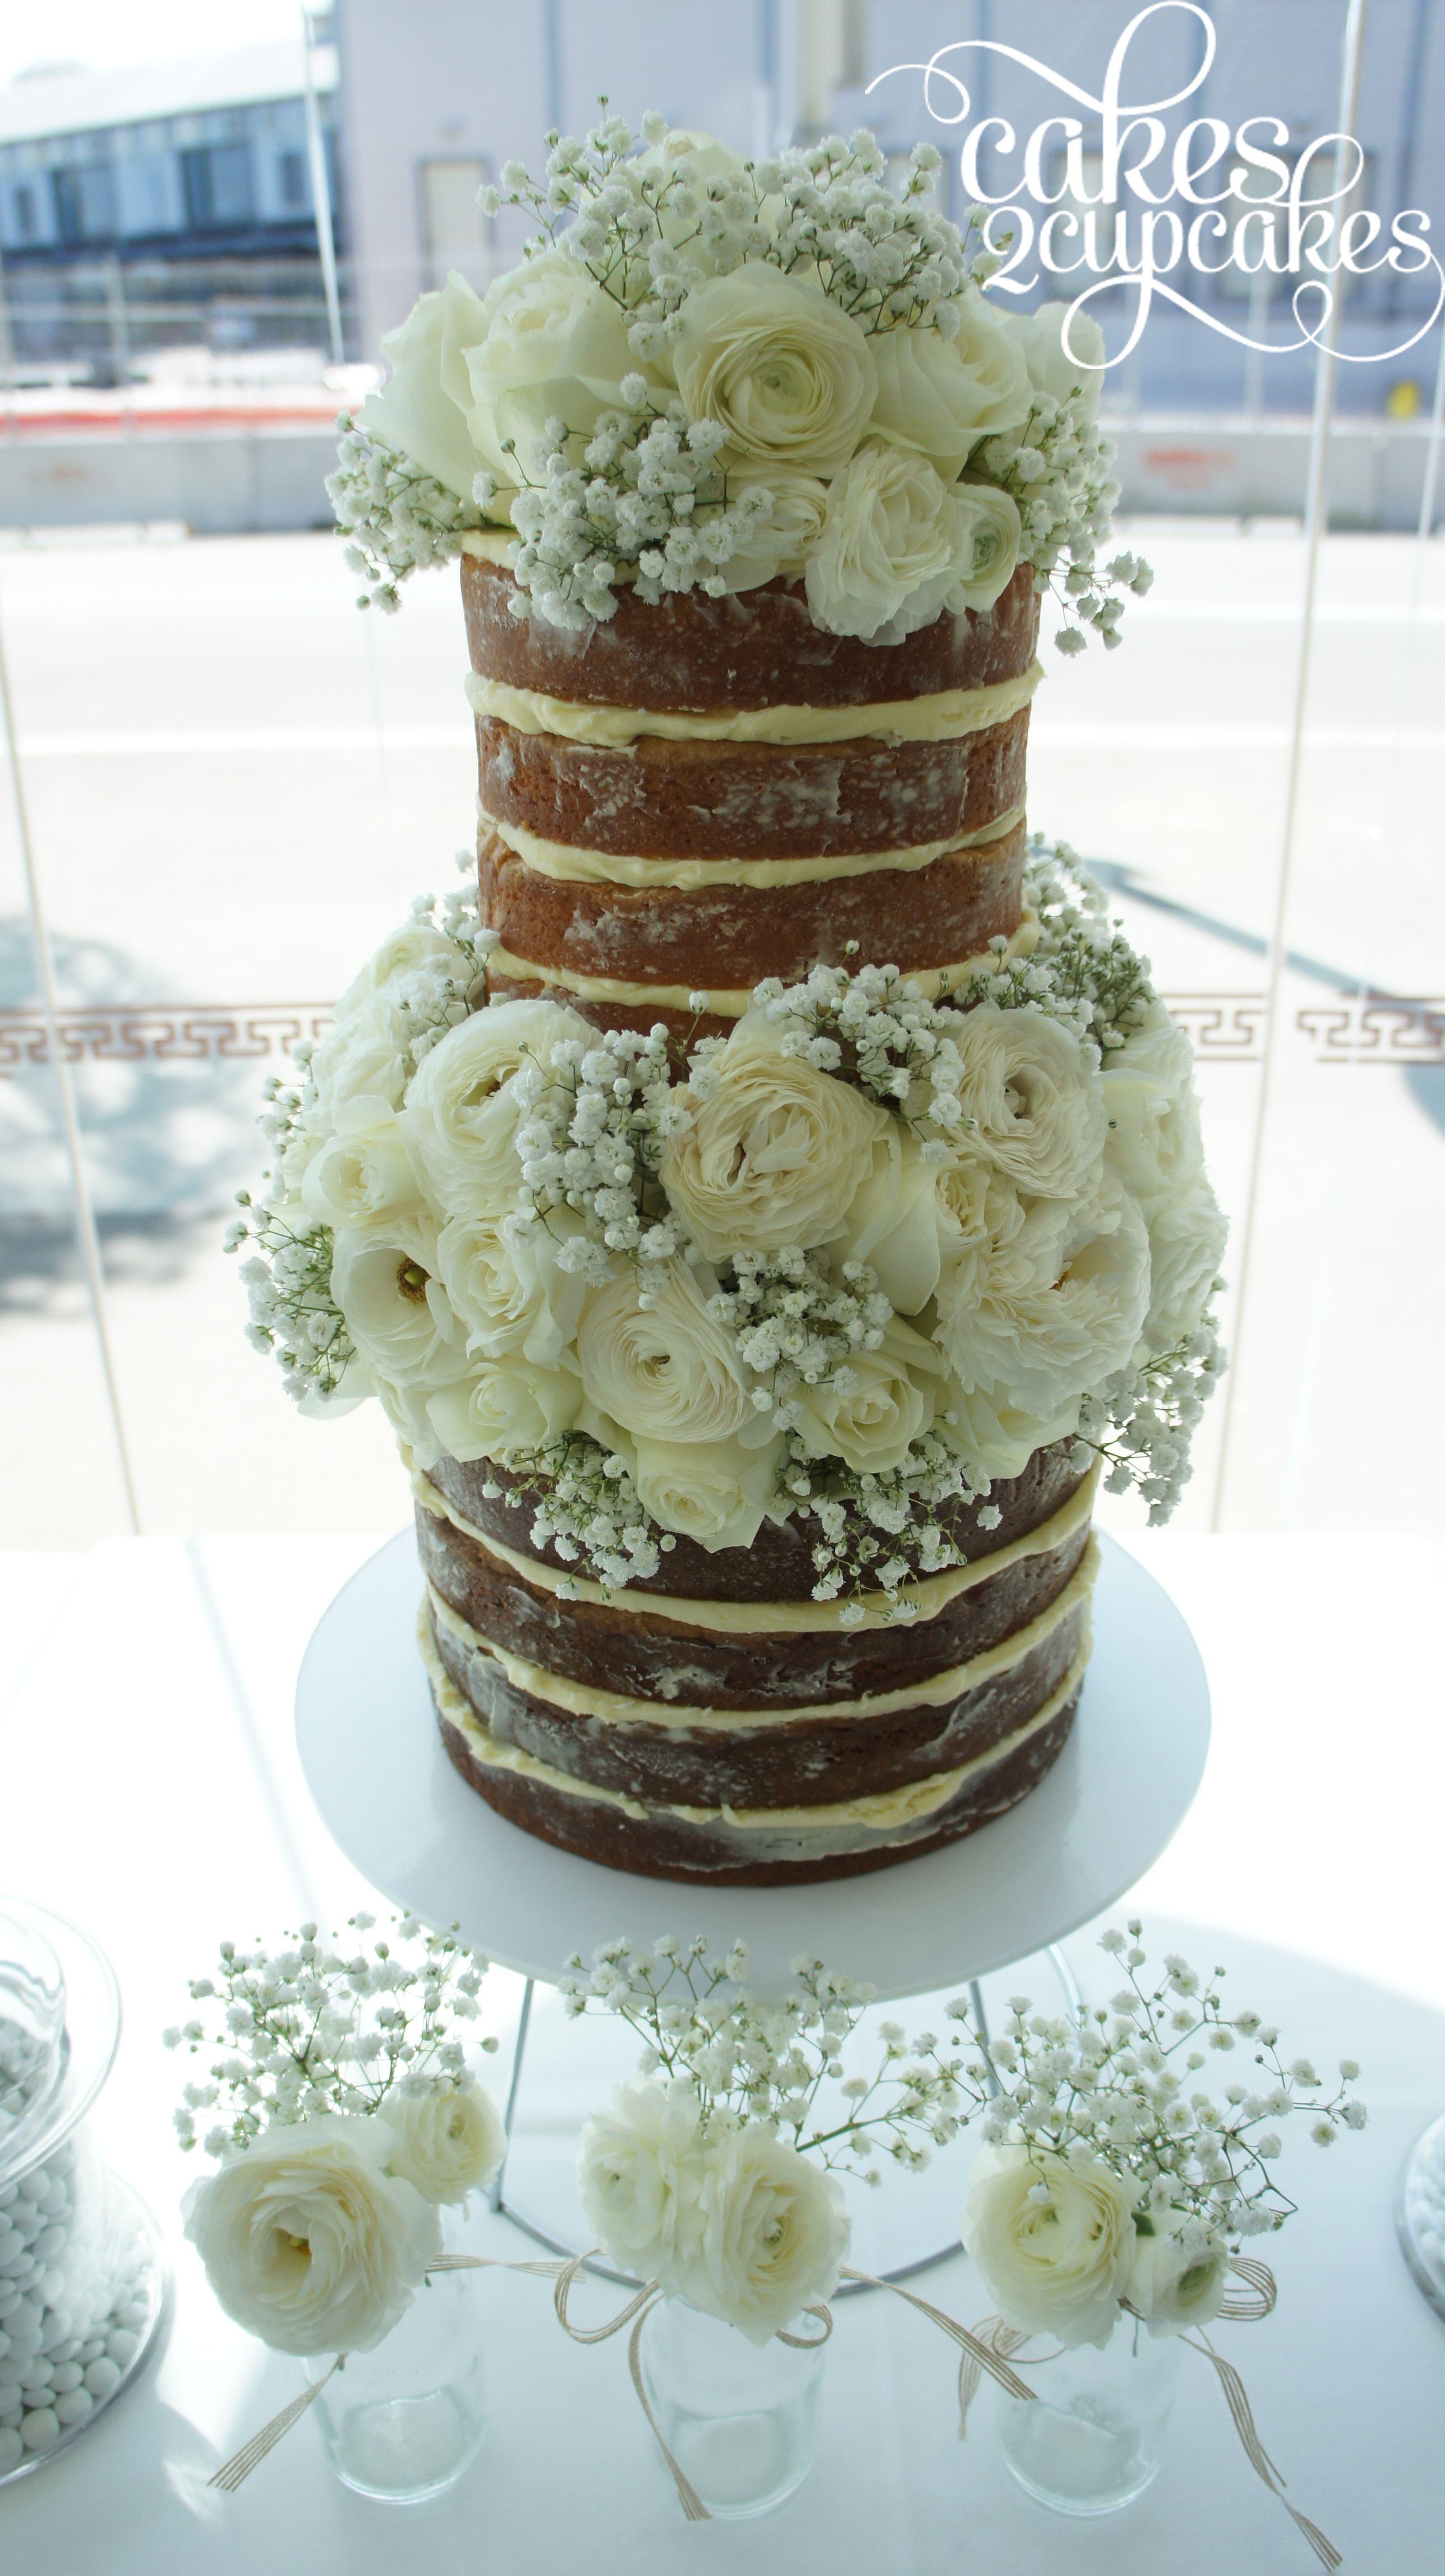 cakes2cupcakes-white-roses.jpg